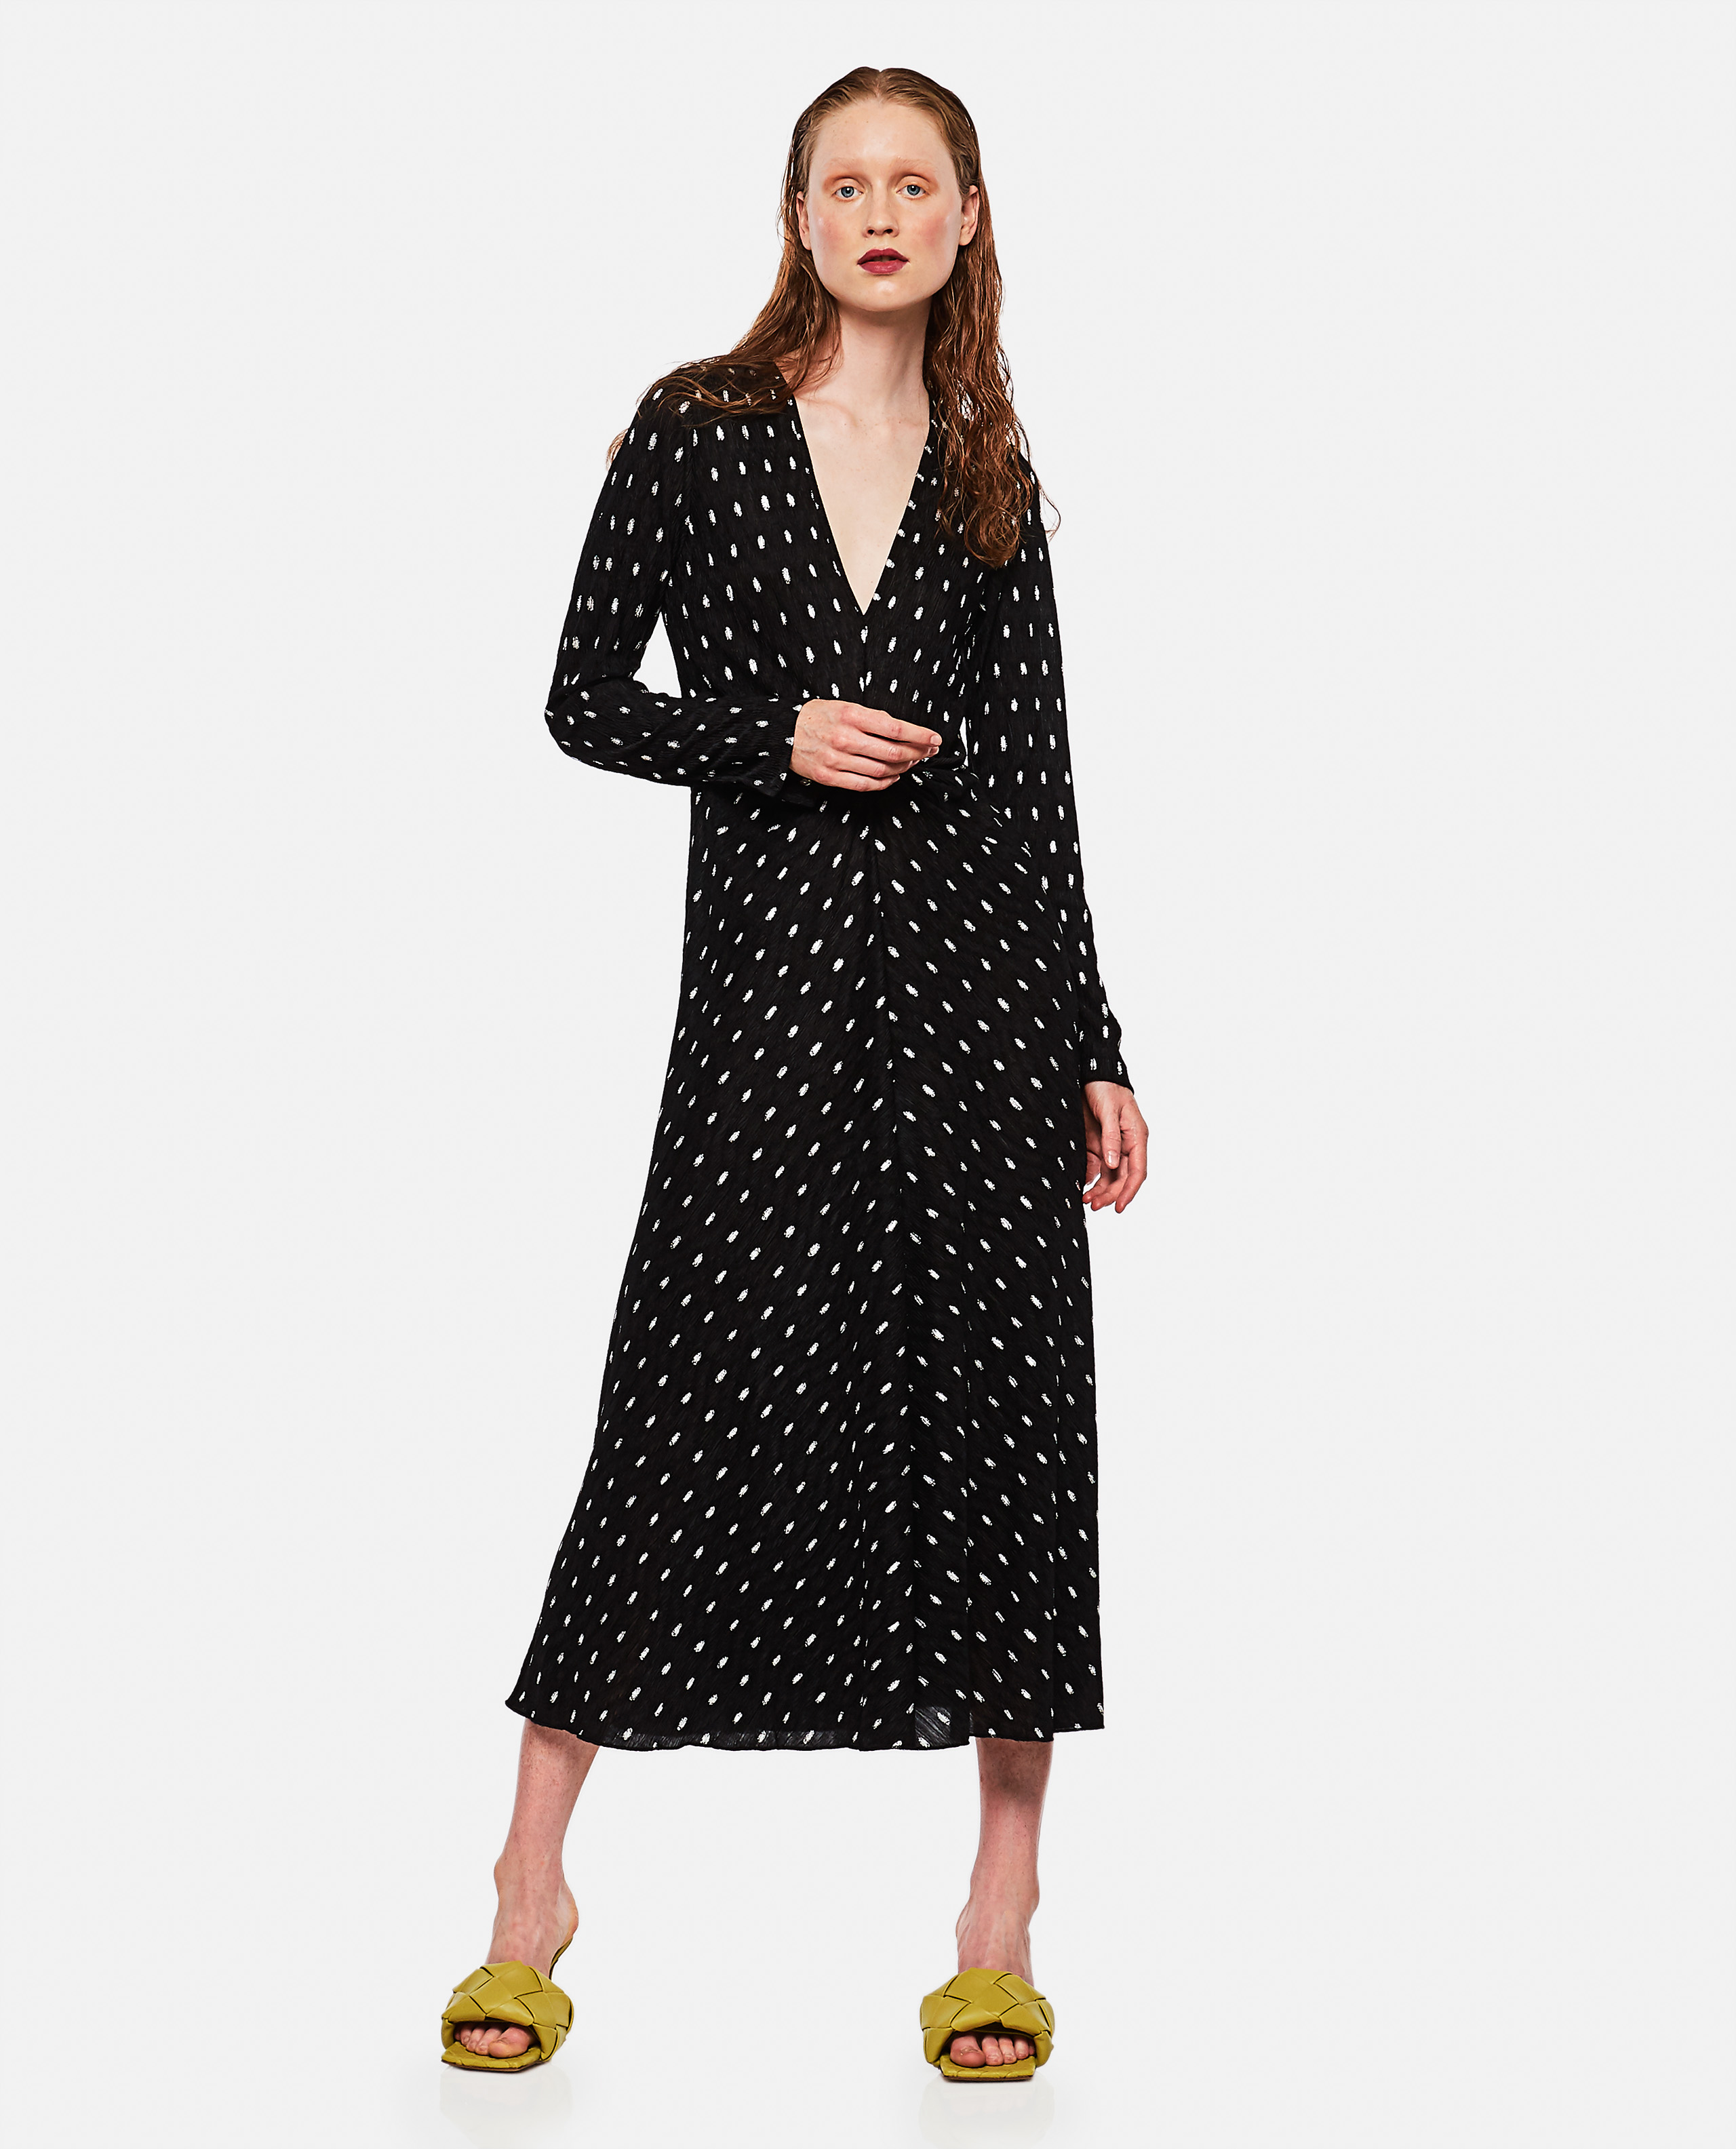 Long black dress with polka dot pattern